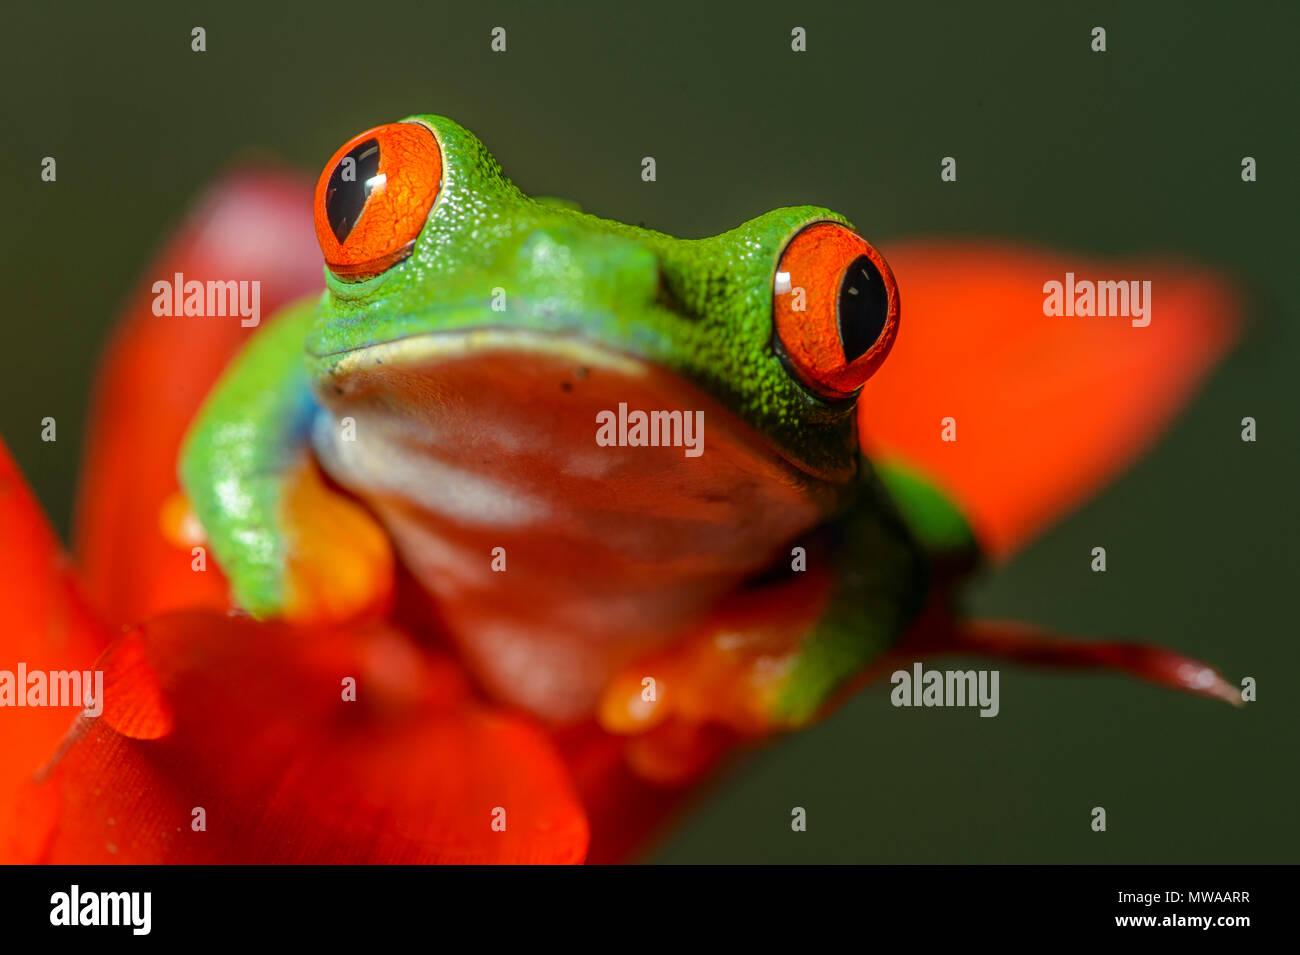 Red-eyed Tree Frog (Agalychnis callidryas), Captive, Reptilien Reptilien Zoo, Vaughan, Ontario, Kanada Stockfoto